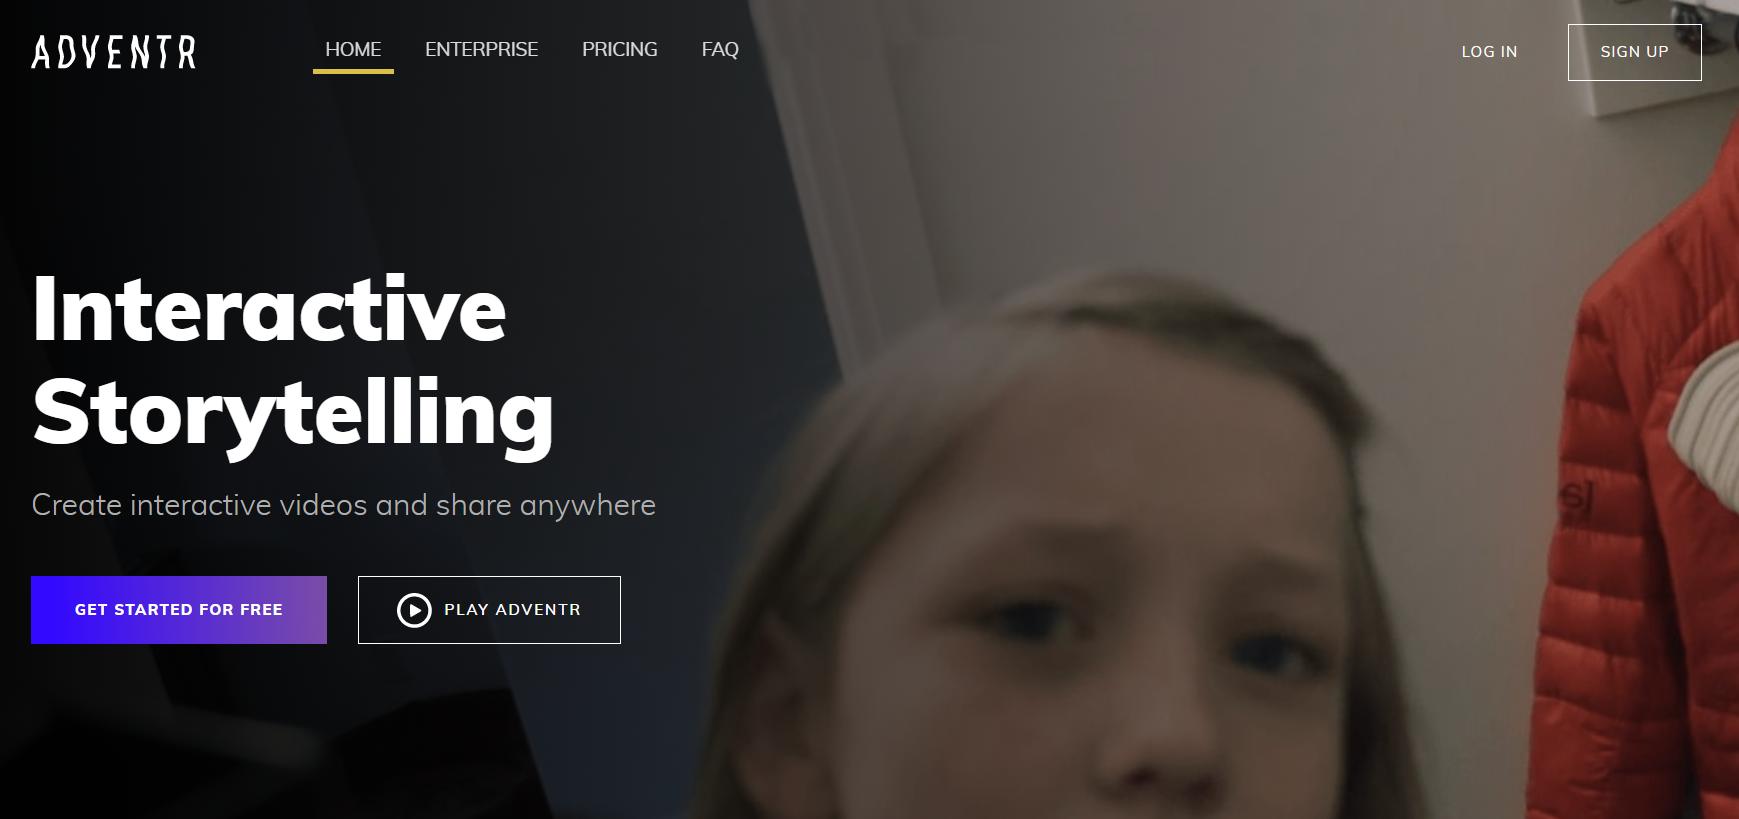 adventr-interactive-video-creation-platform